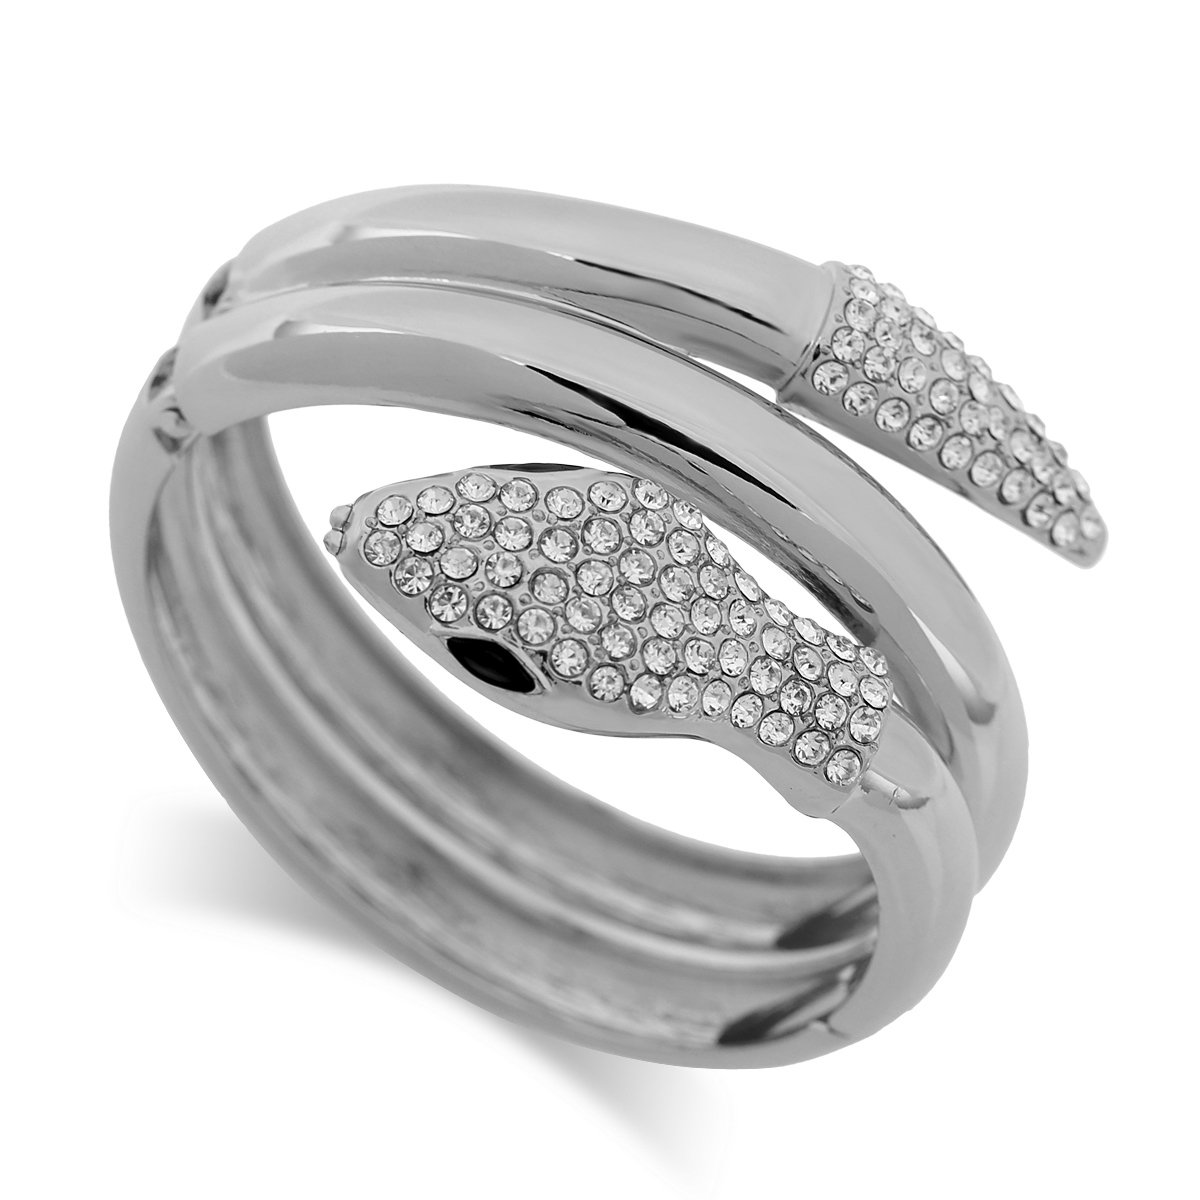 KAYMEN FASHION JEWELLERY Fashionable Inlaid Rhinestones Snake Shape Silver Plated Cuff Bangle for Women